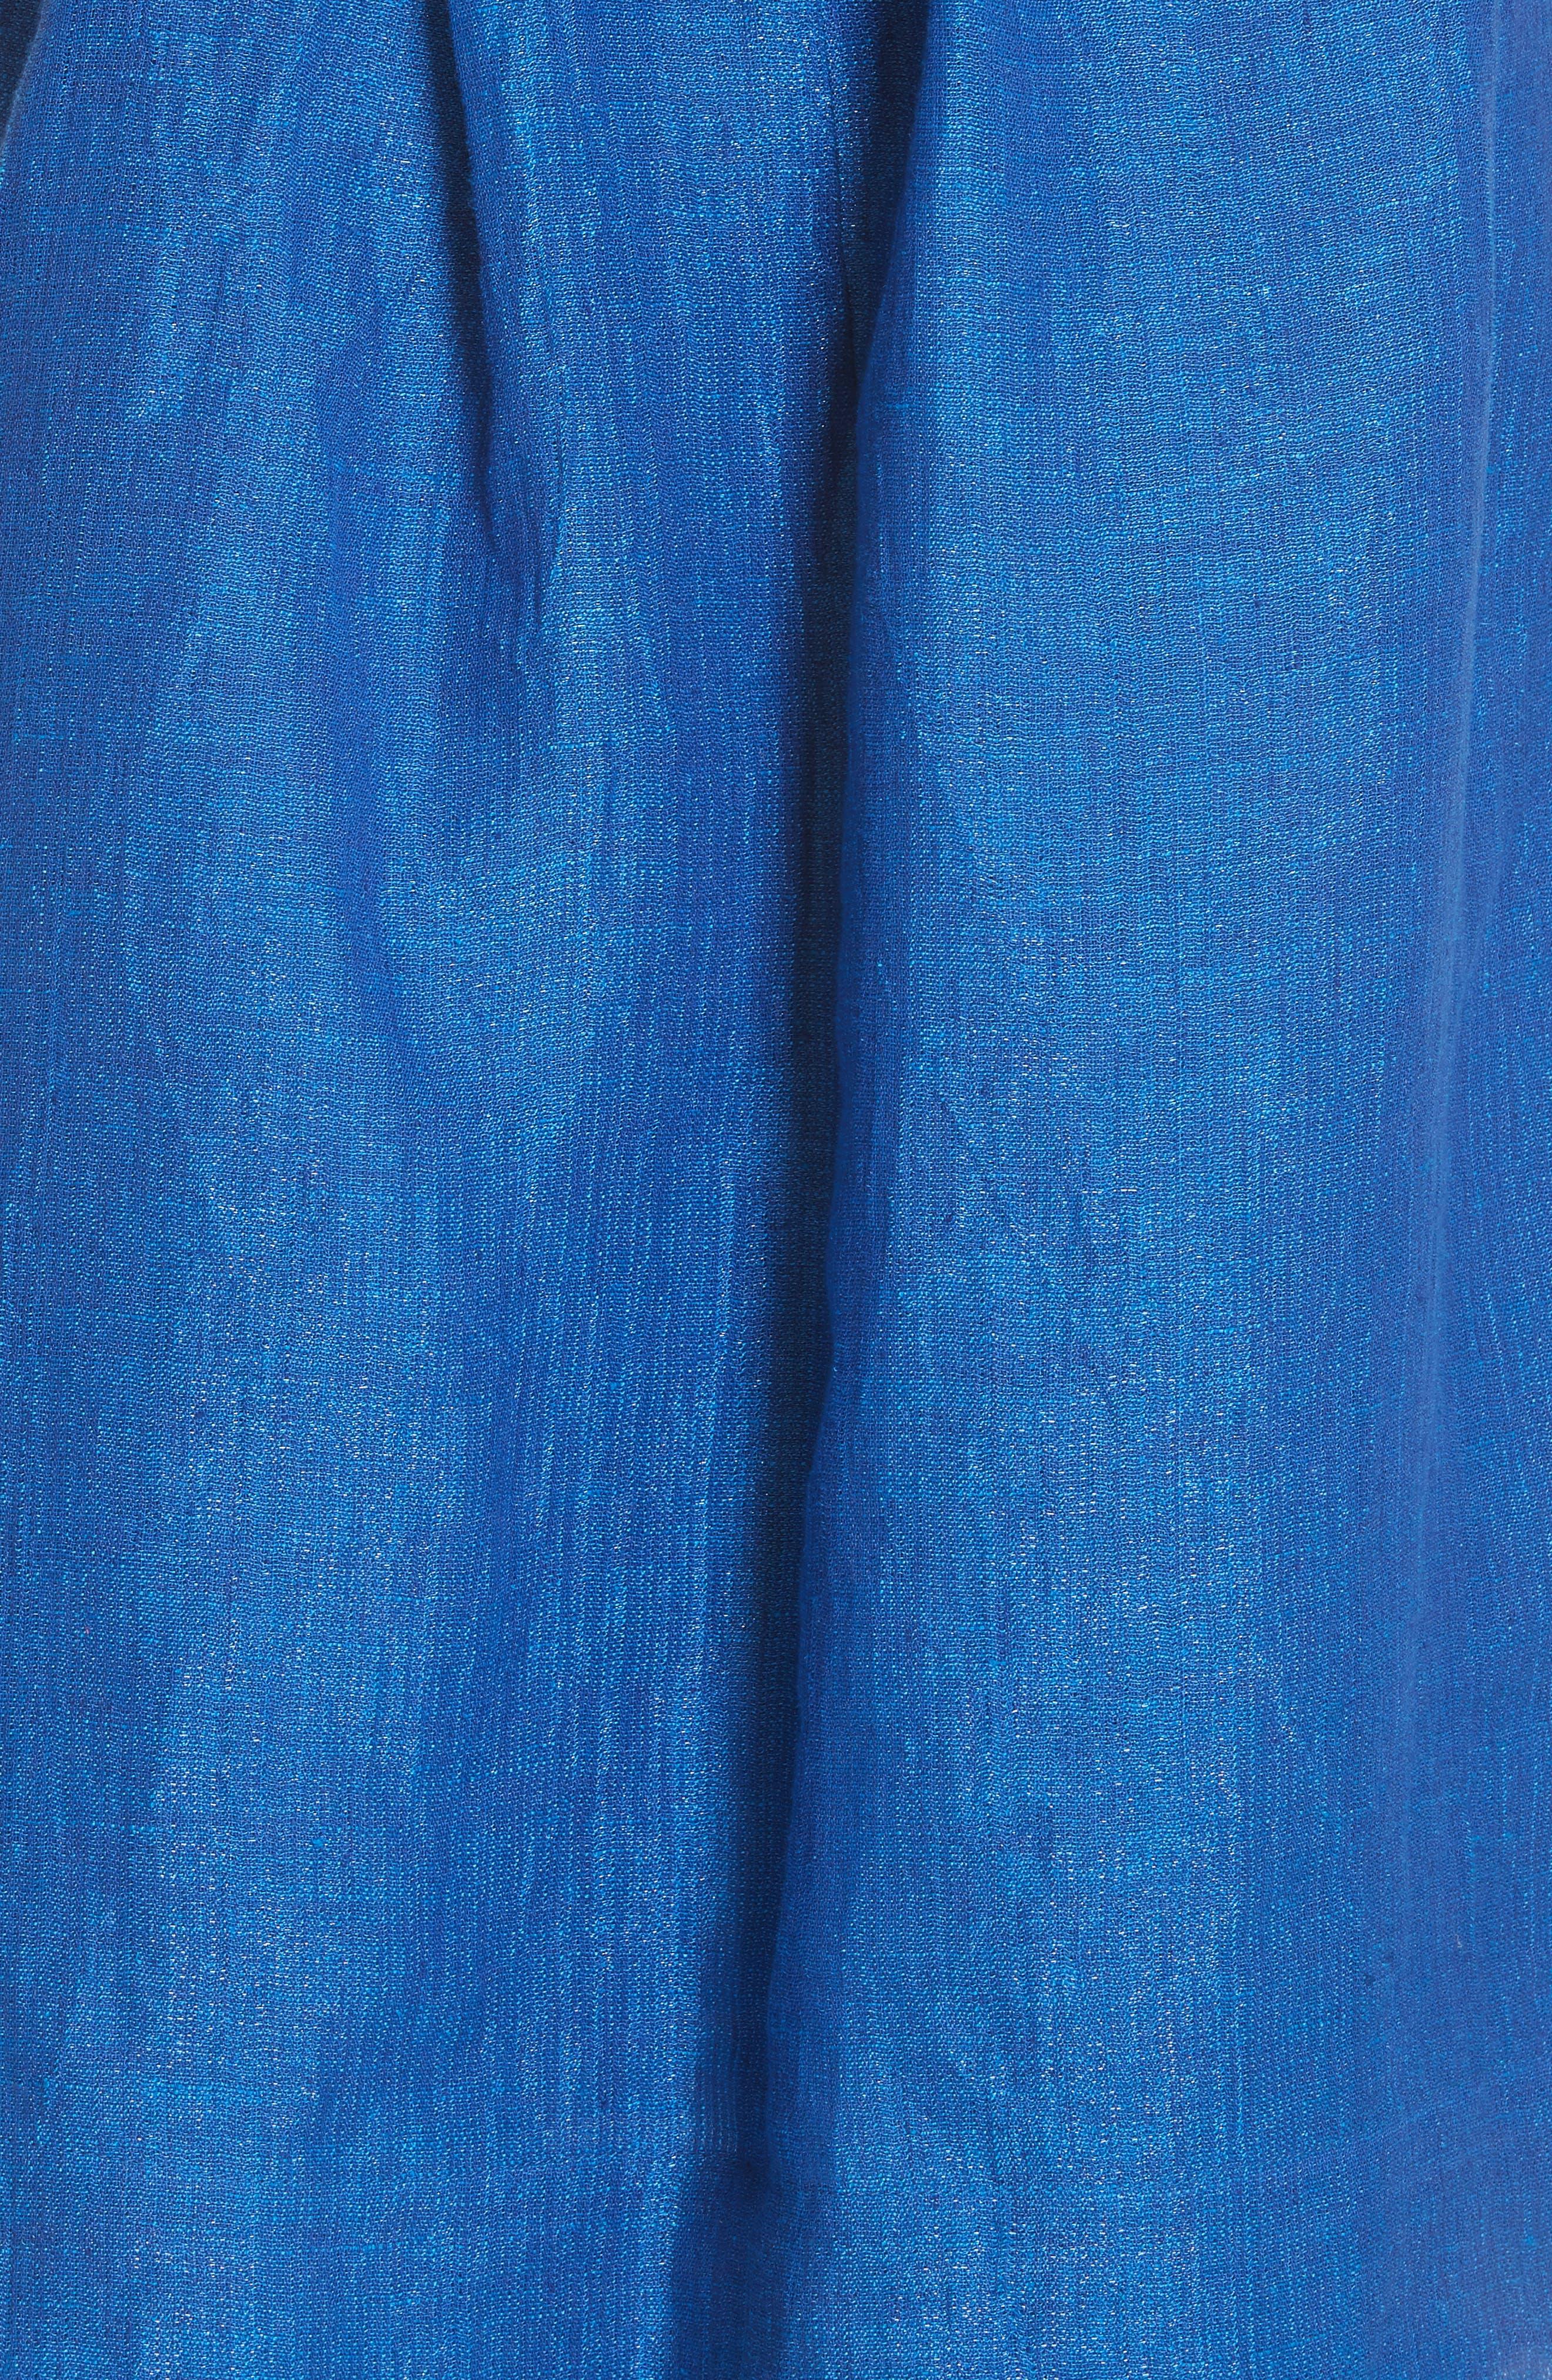 Open Sleeve Backless Linen Blend Dress,                             Alternate thumbnail 5, color,                             409